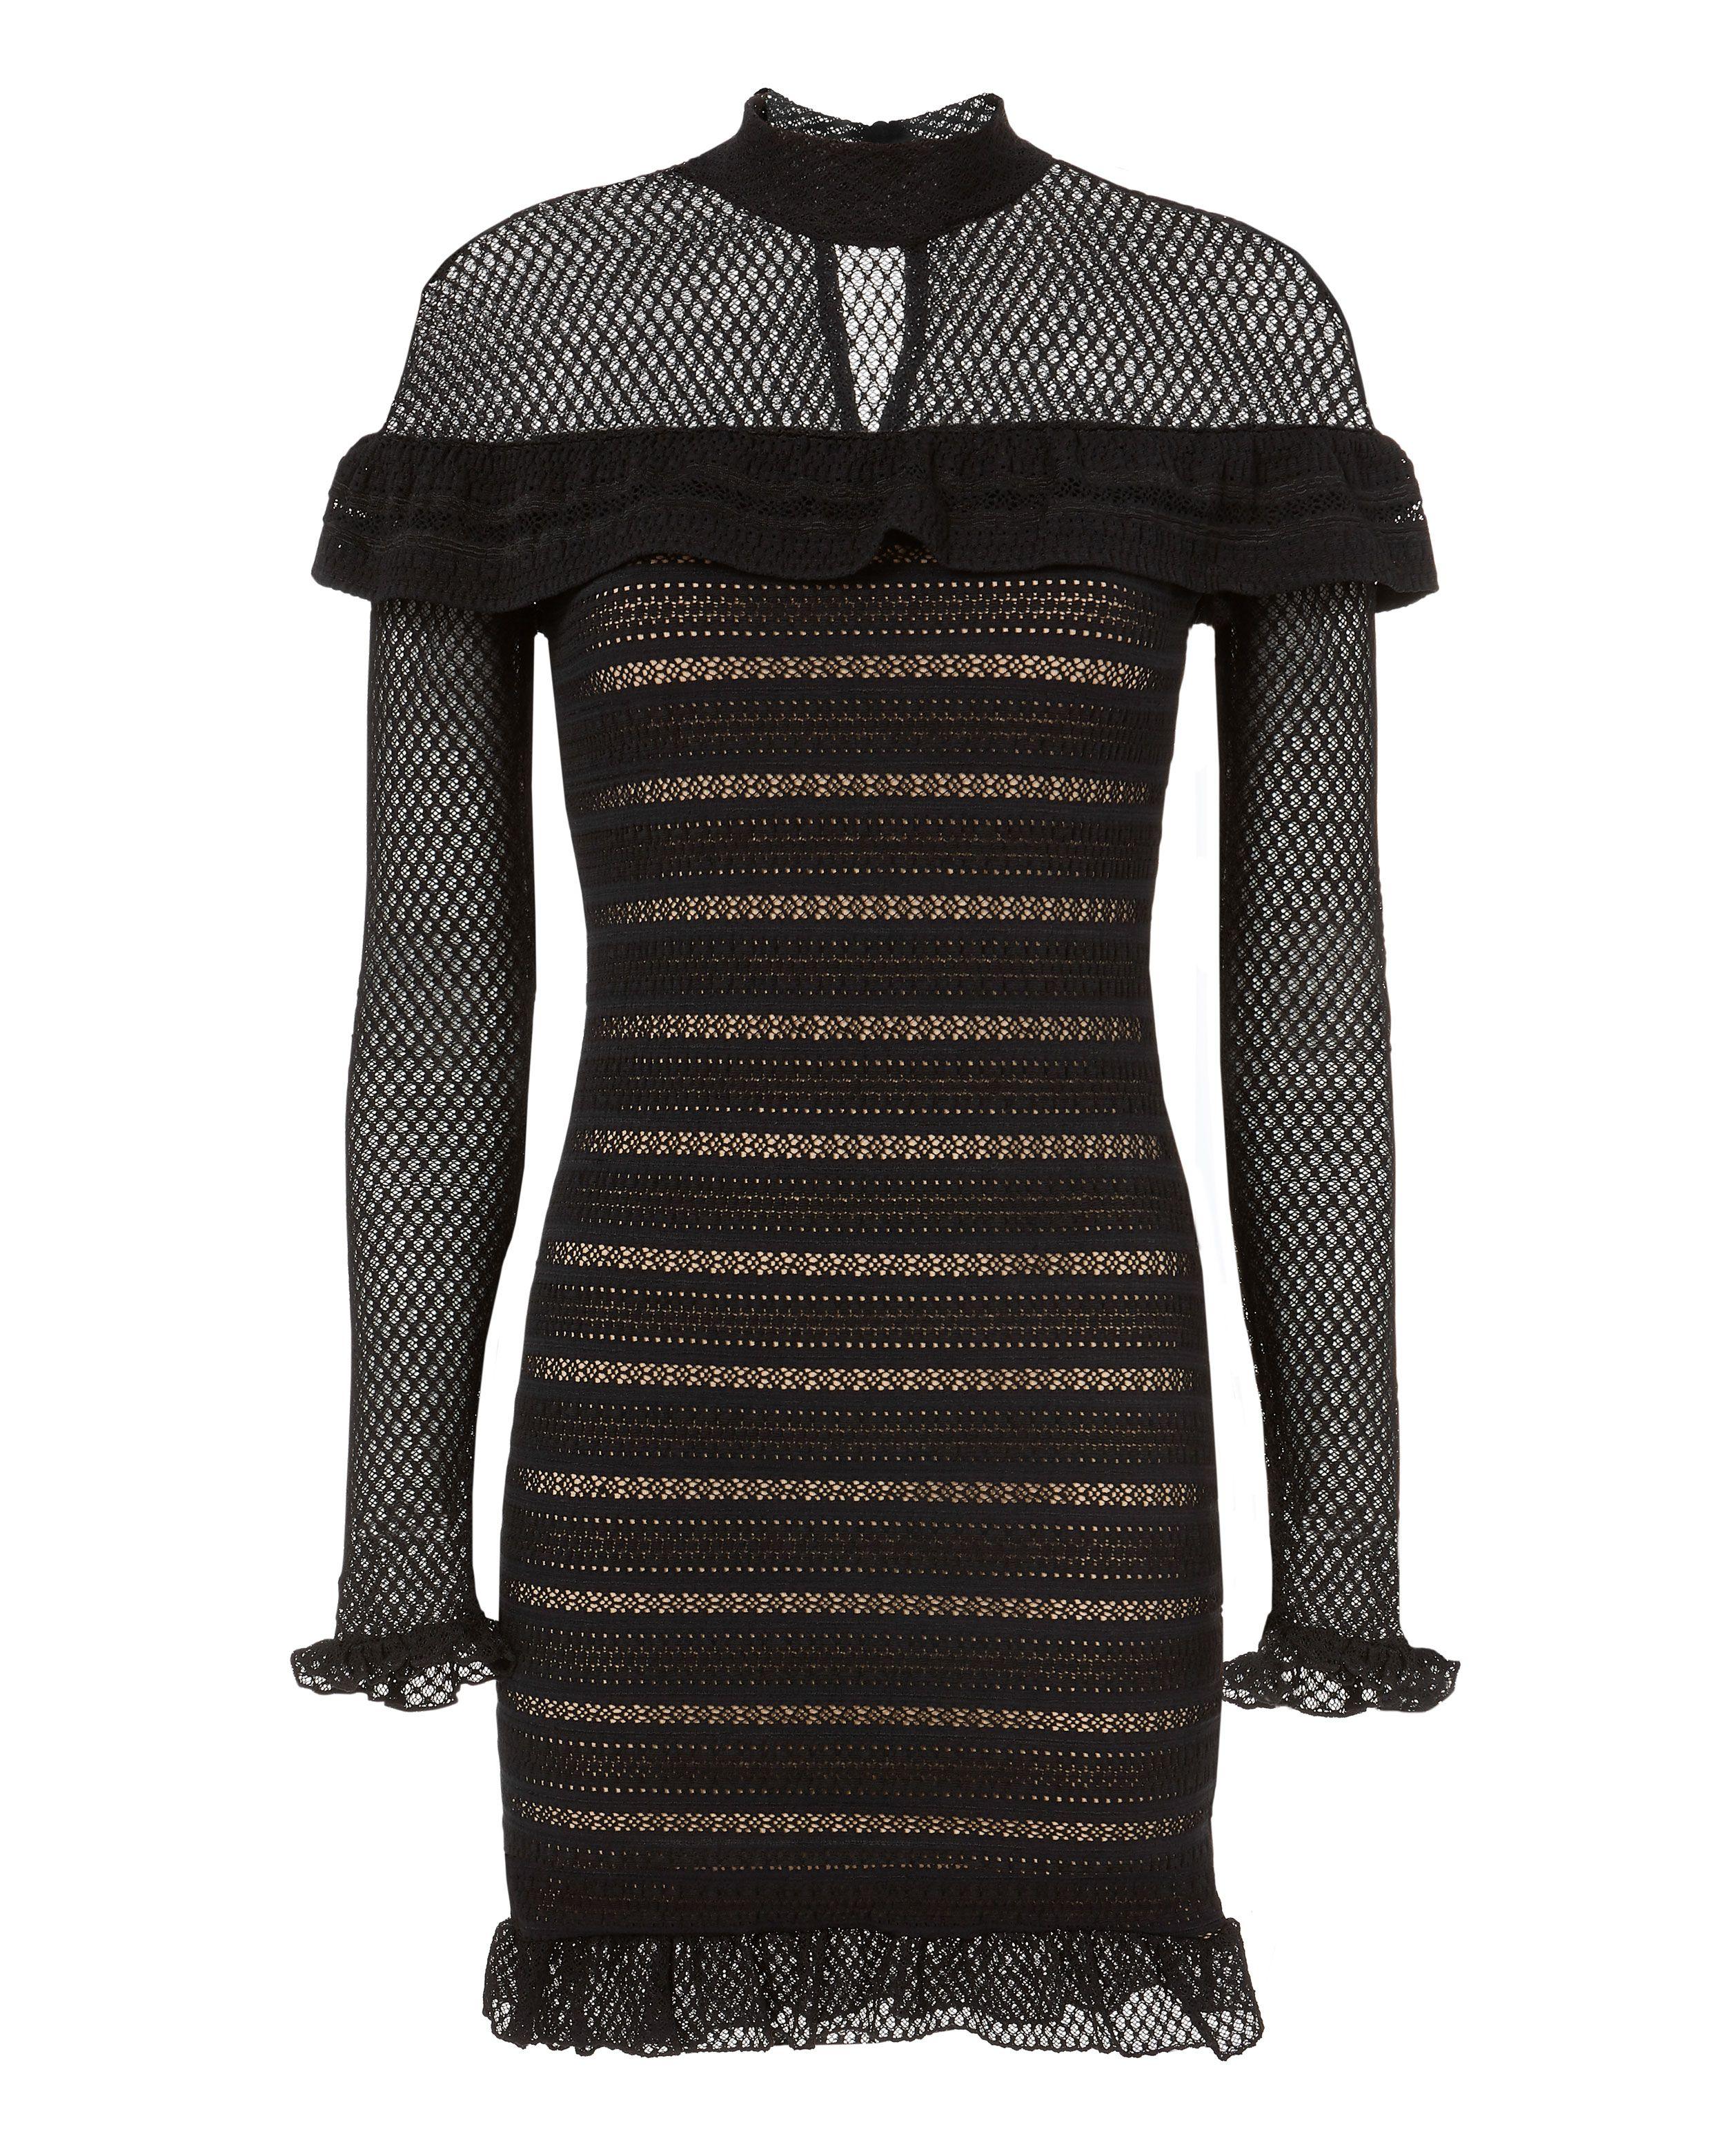 Nightcap Clothing Mariabella Lace Mini Dress Modesens Mini Dress Fashion Lace Mini Dress Mini Black Dress